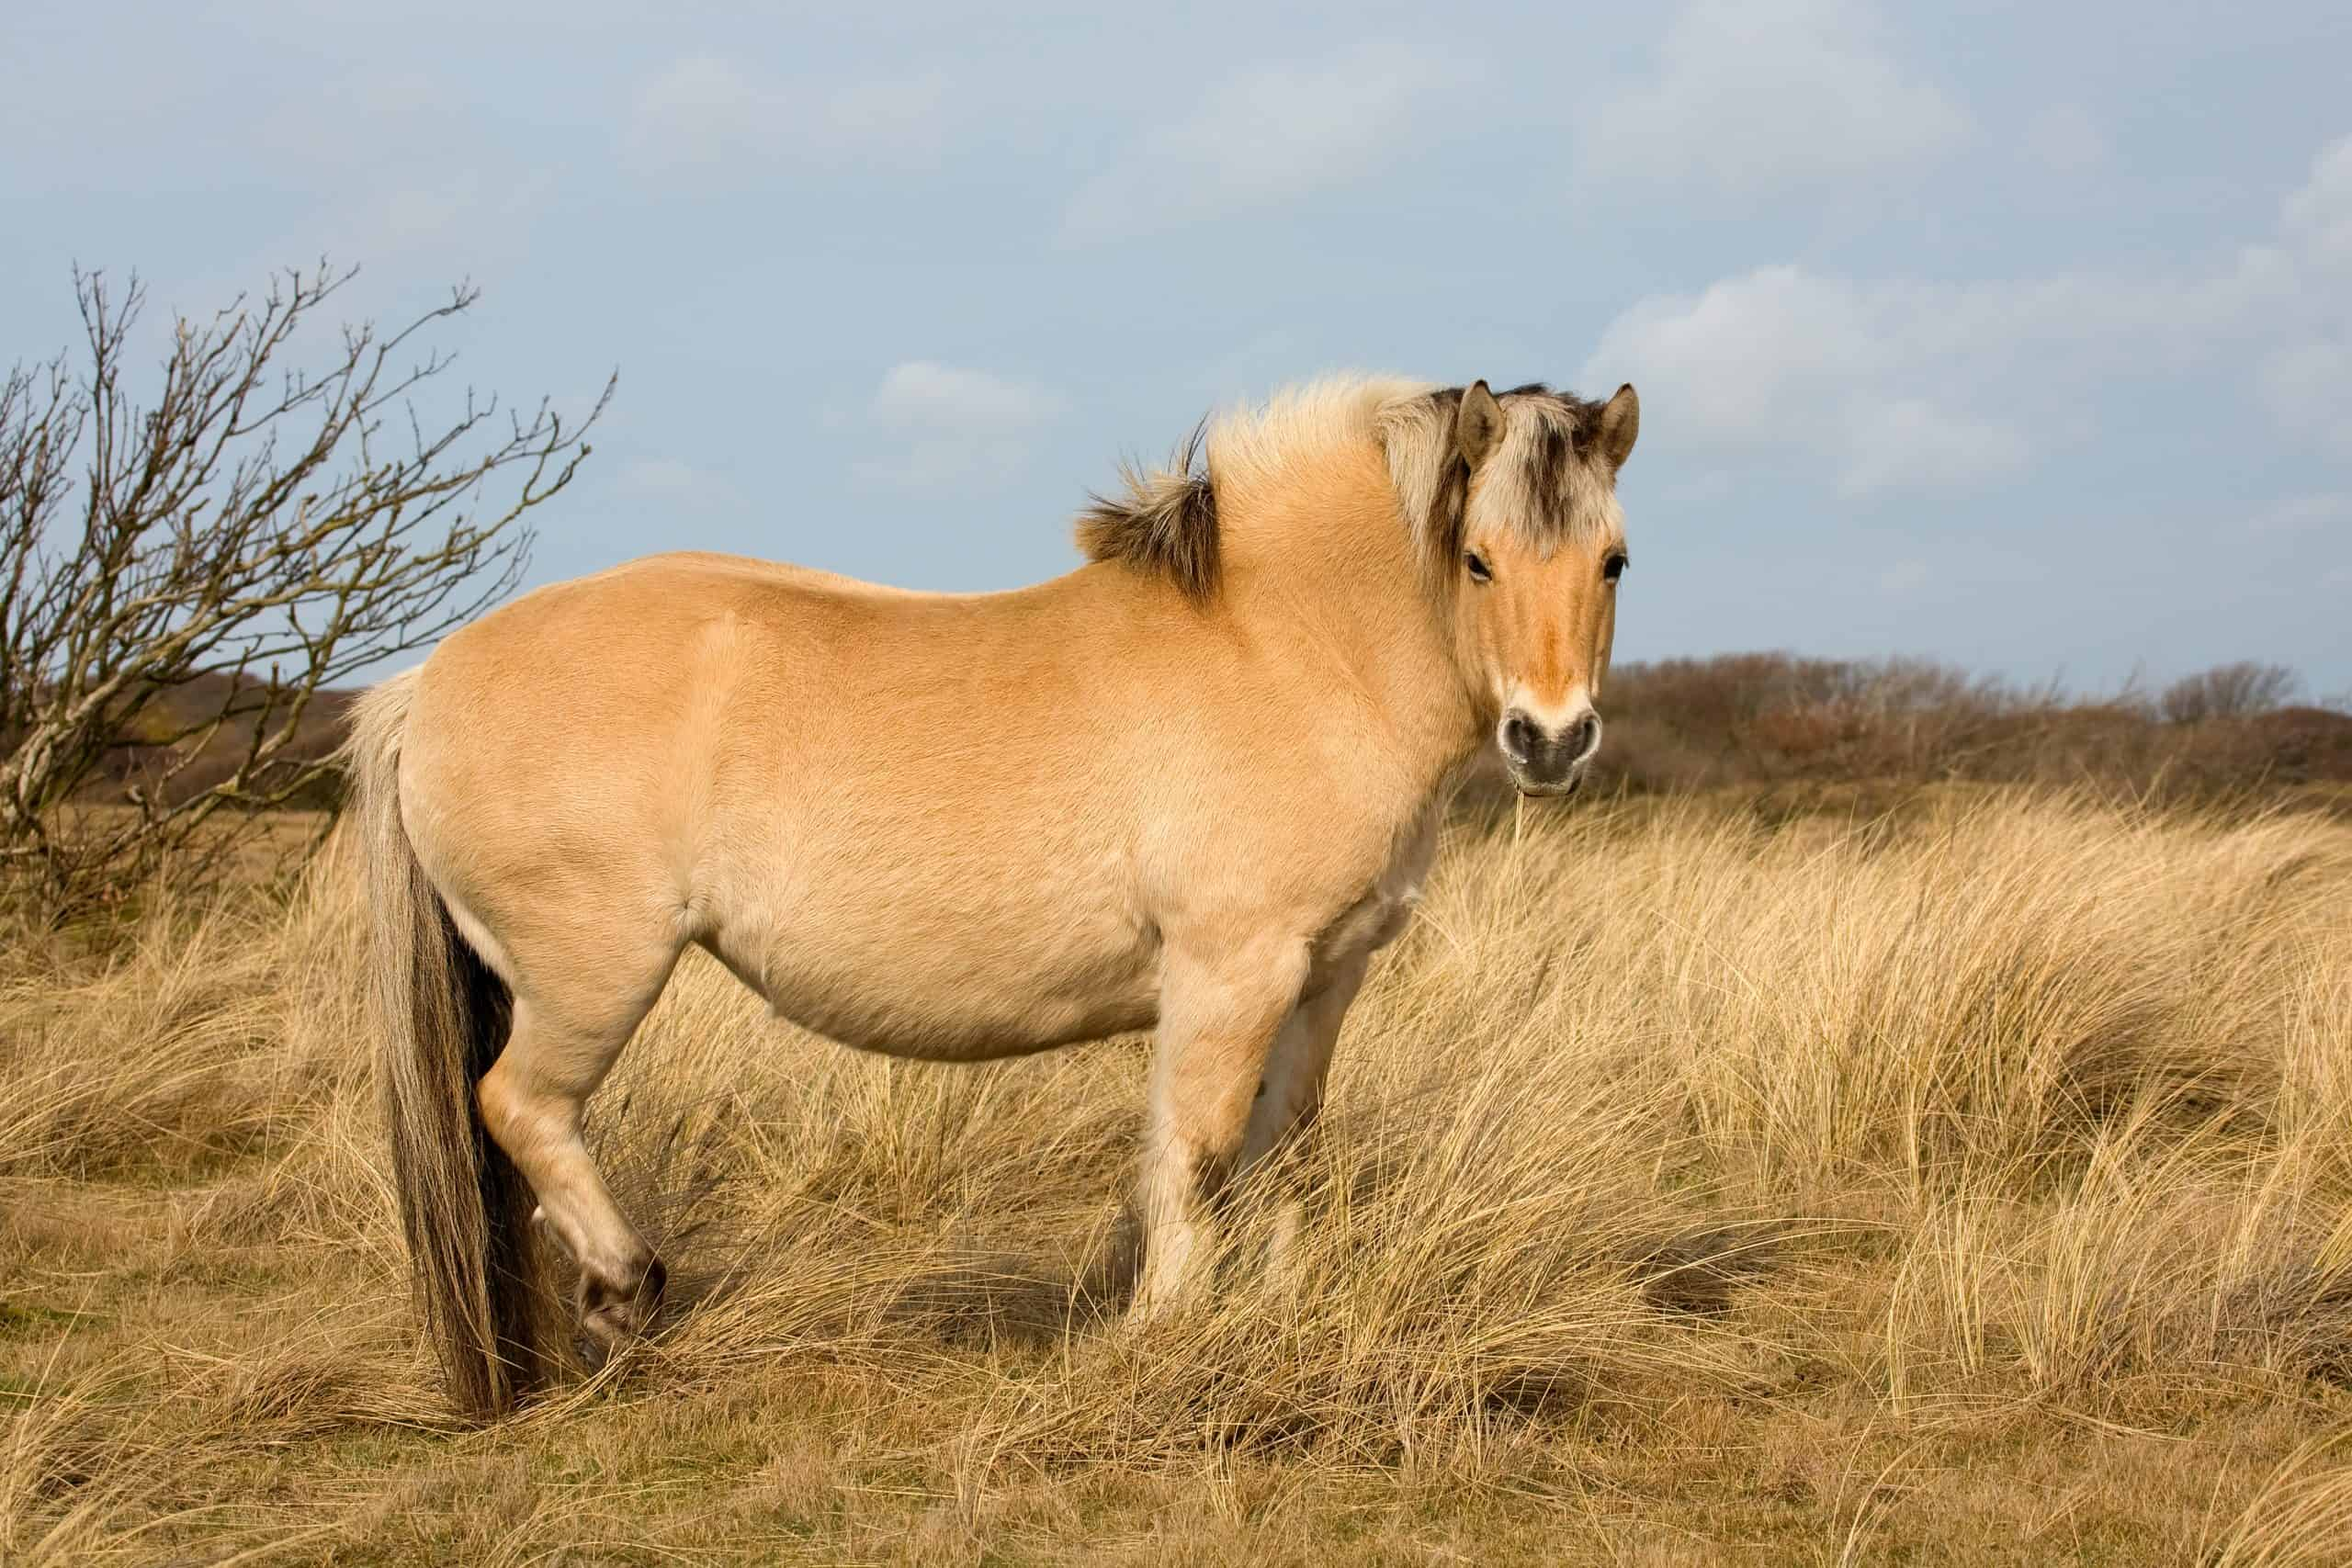 Norwegian Fjord horse in nature resevoir (dune area)